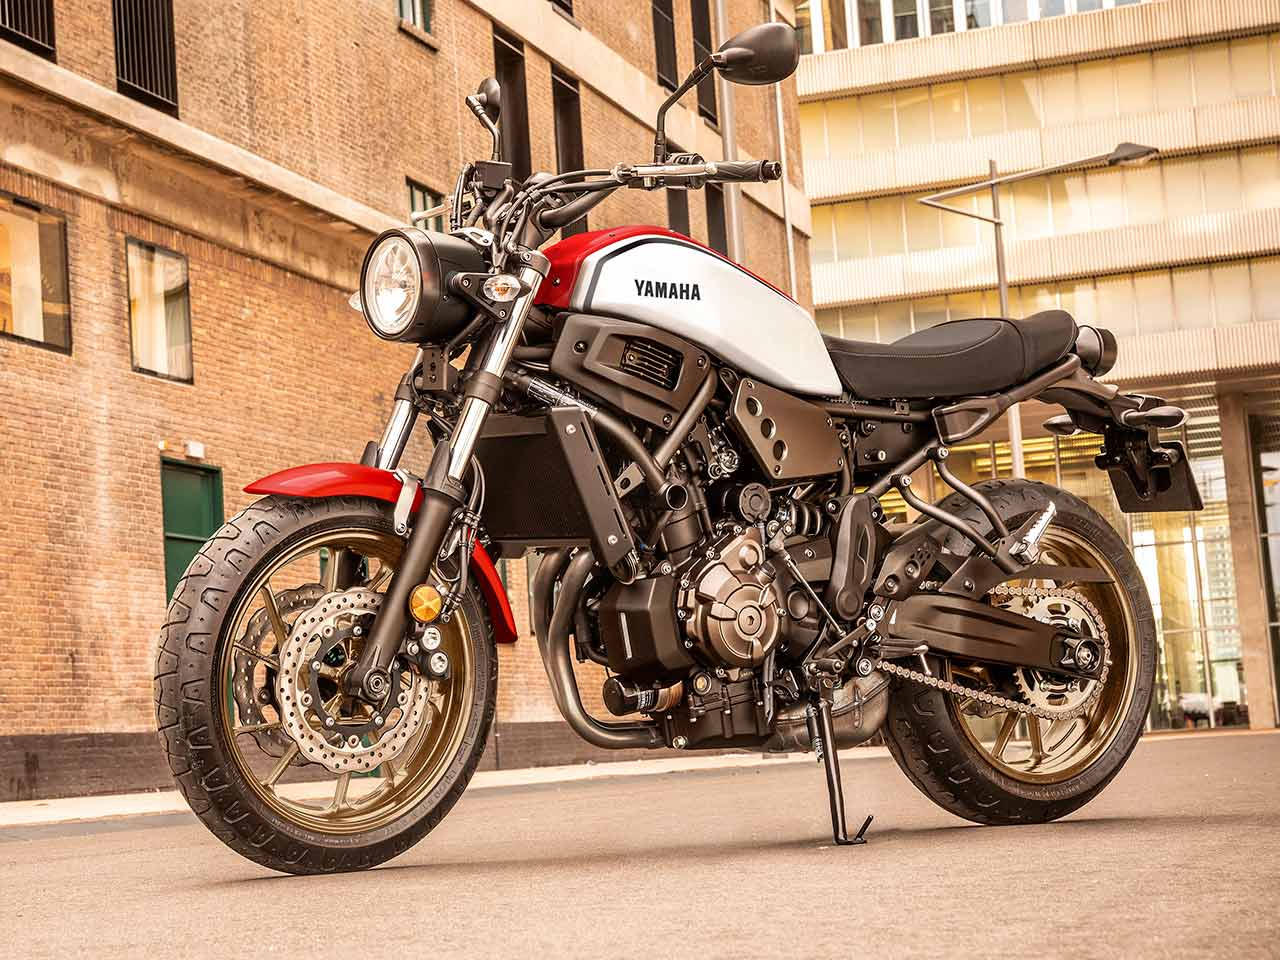 2020 Yamaha XSR700 Gallery 2